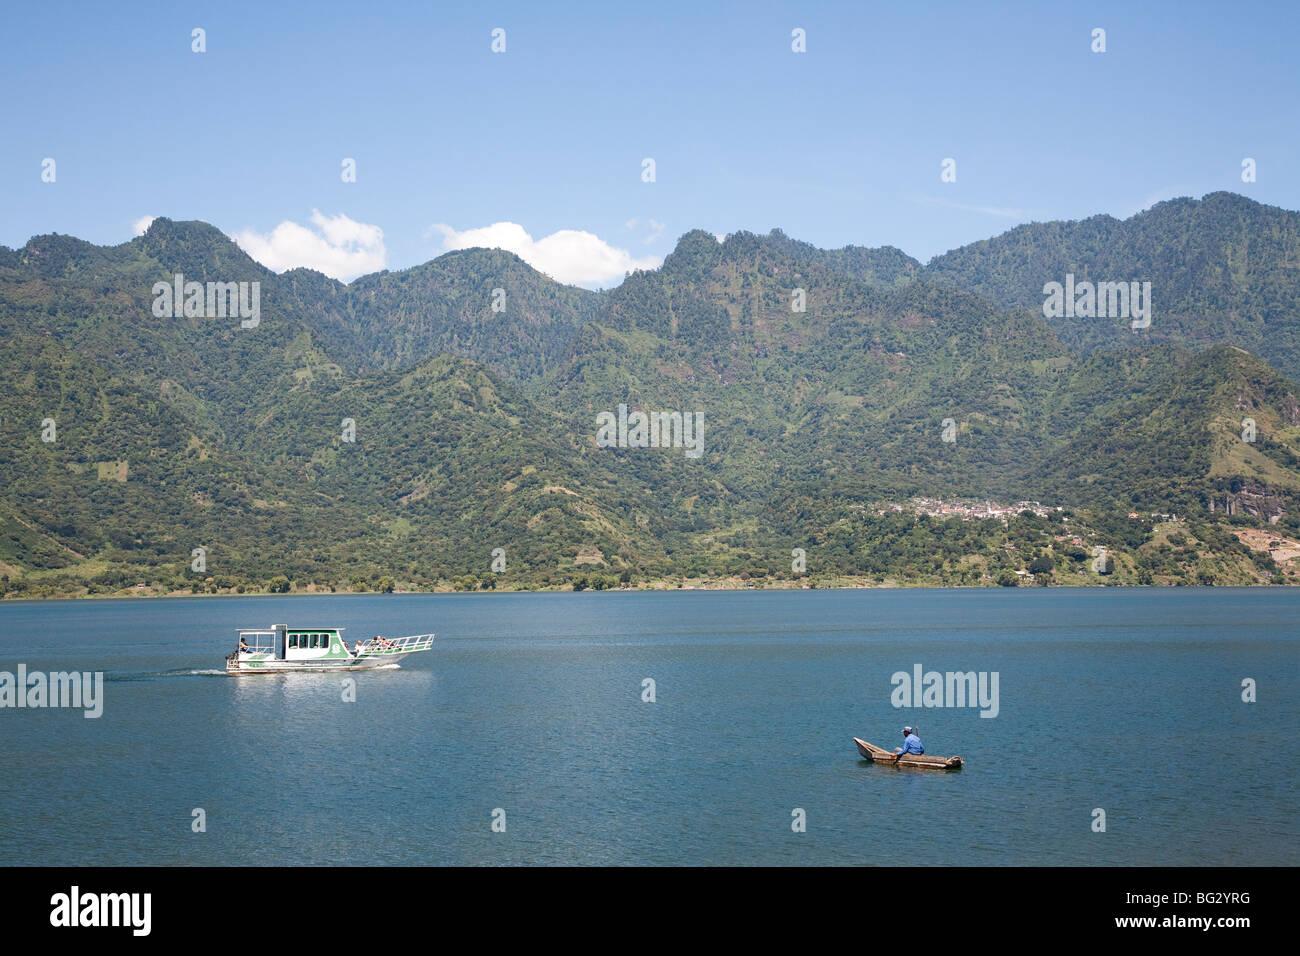 Boatstour on Lake Atitlan Guatemala. - Stock Image